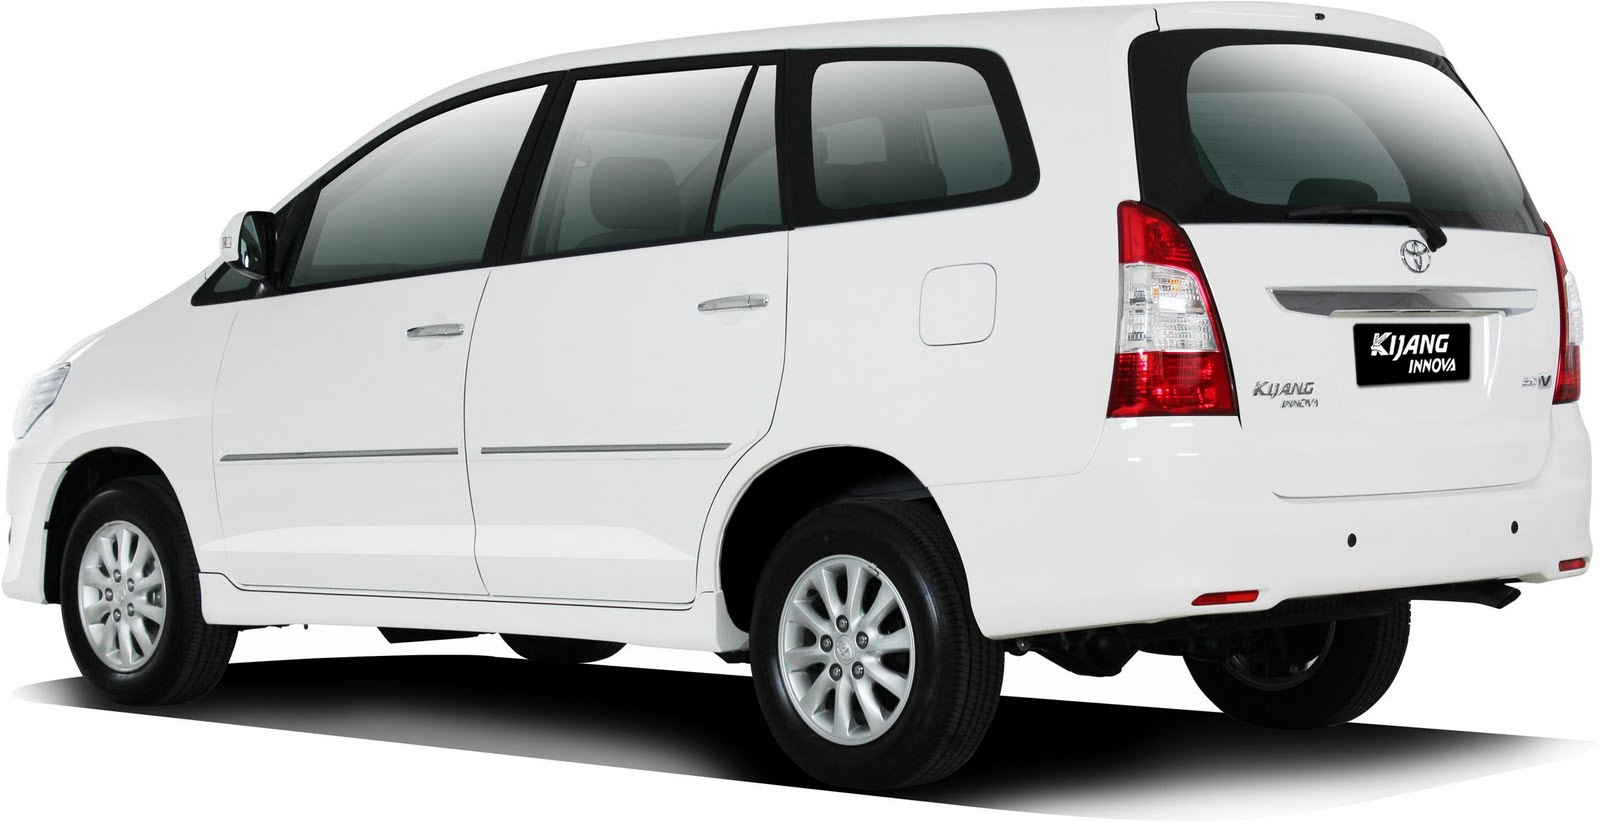 all new kijang innova 2.4 g at diesel ukuran wiper grand avanza harga mobil inova valorro